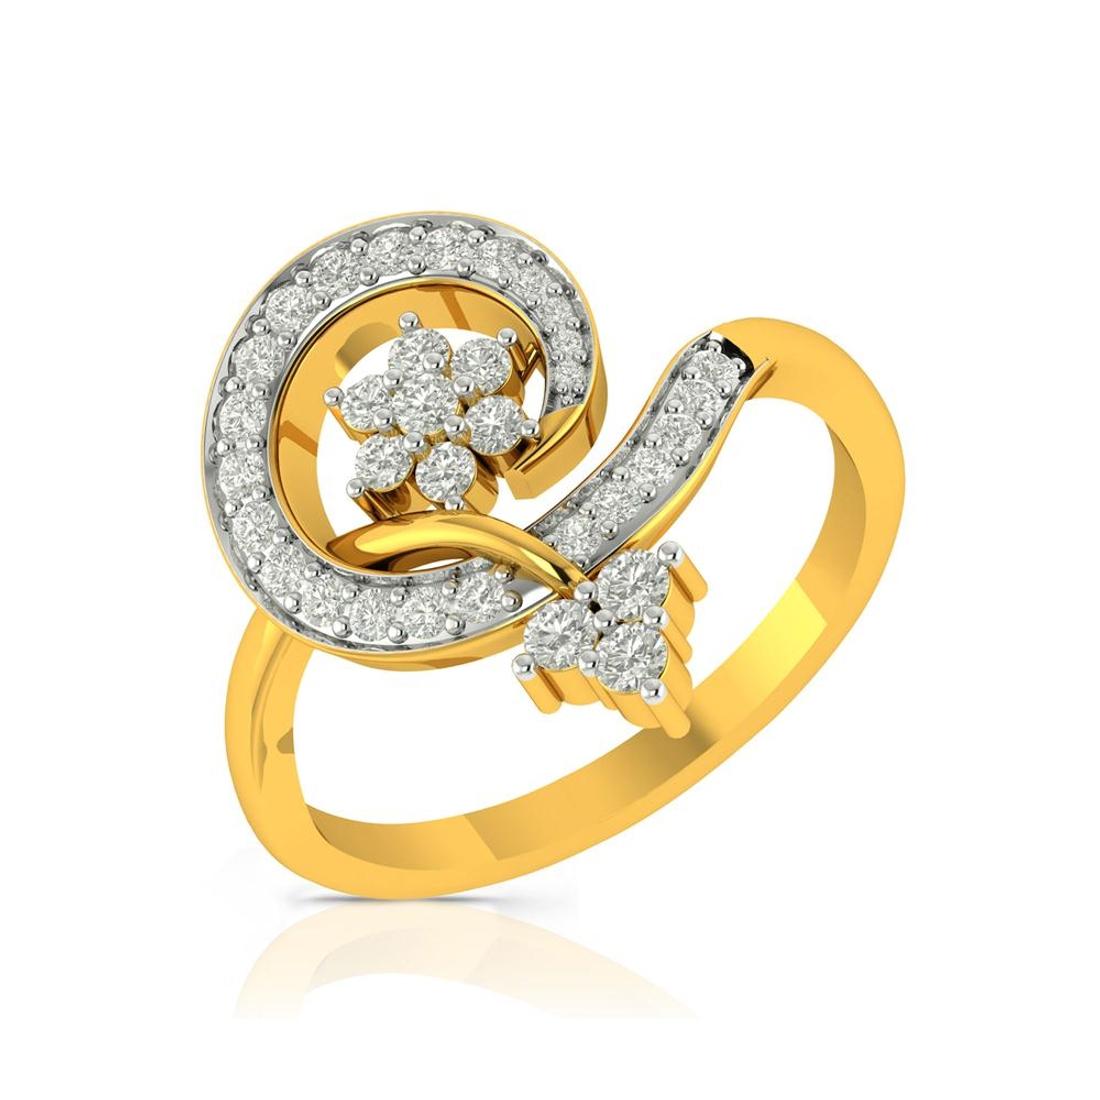 Buy Charu Jewels Diamond Ladies Ring CJLR0262 Online in India